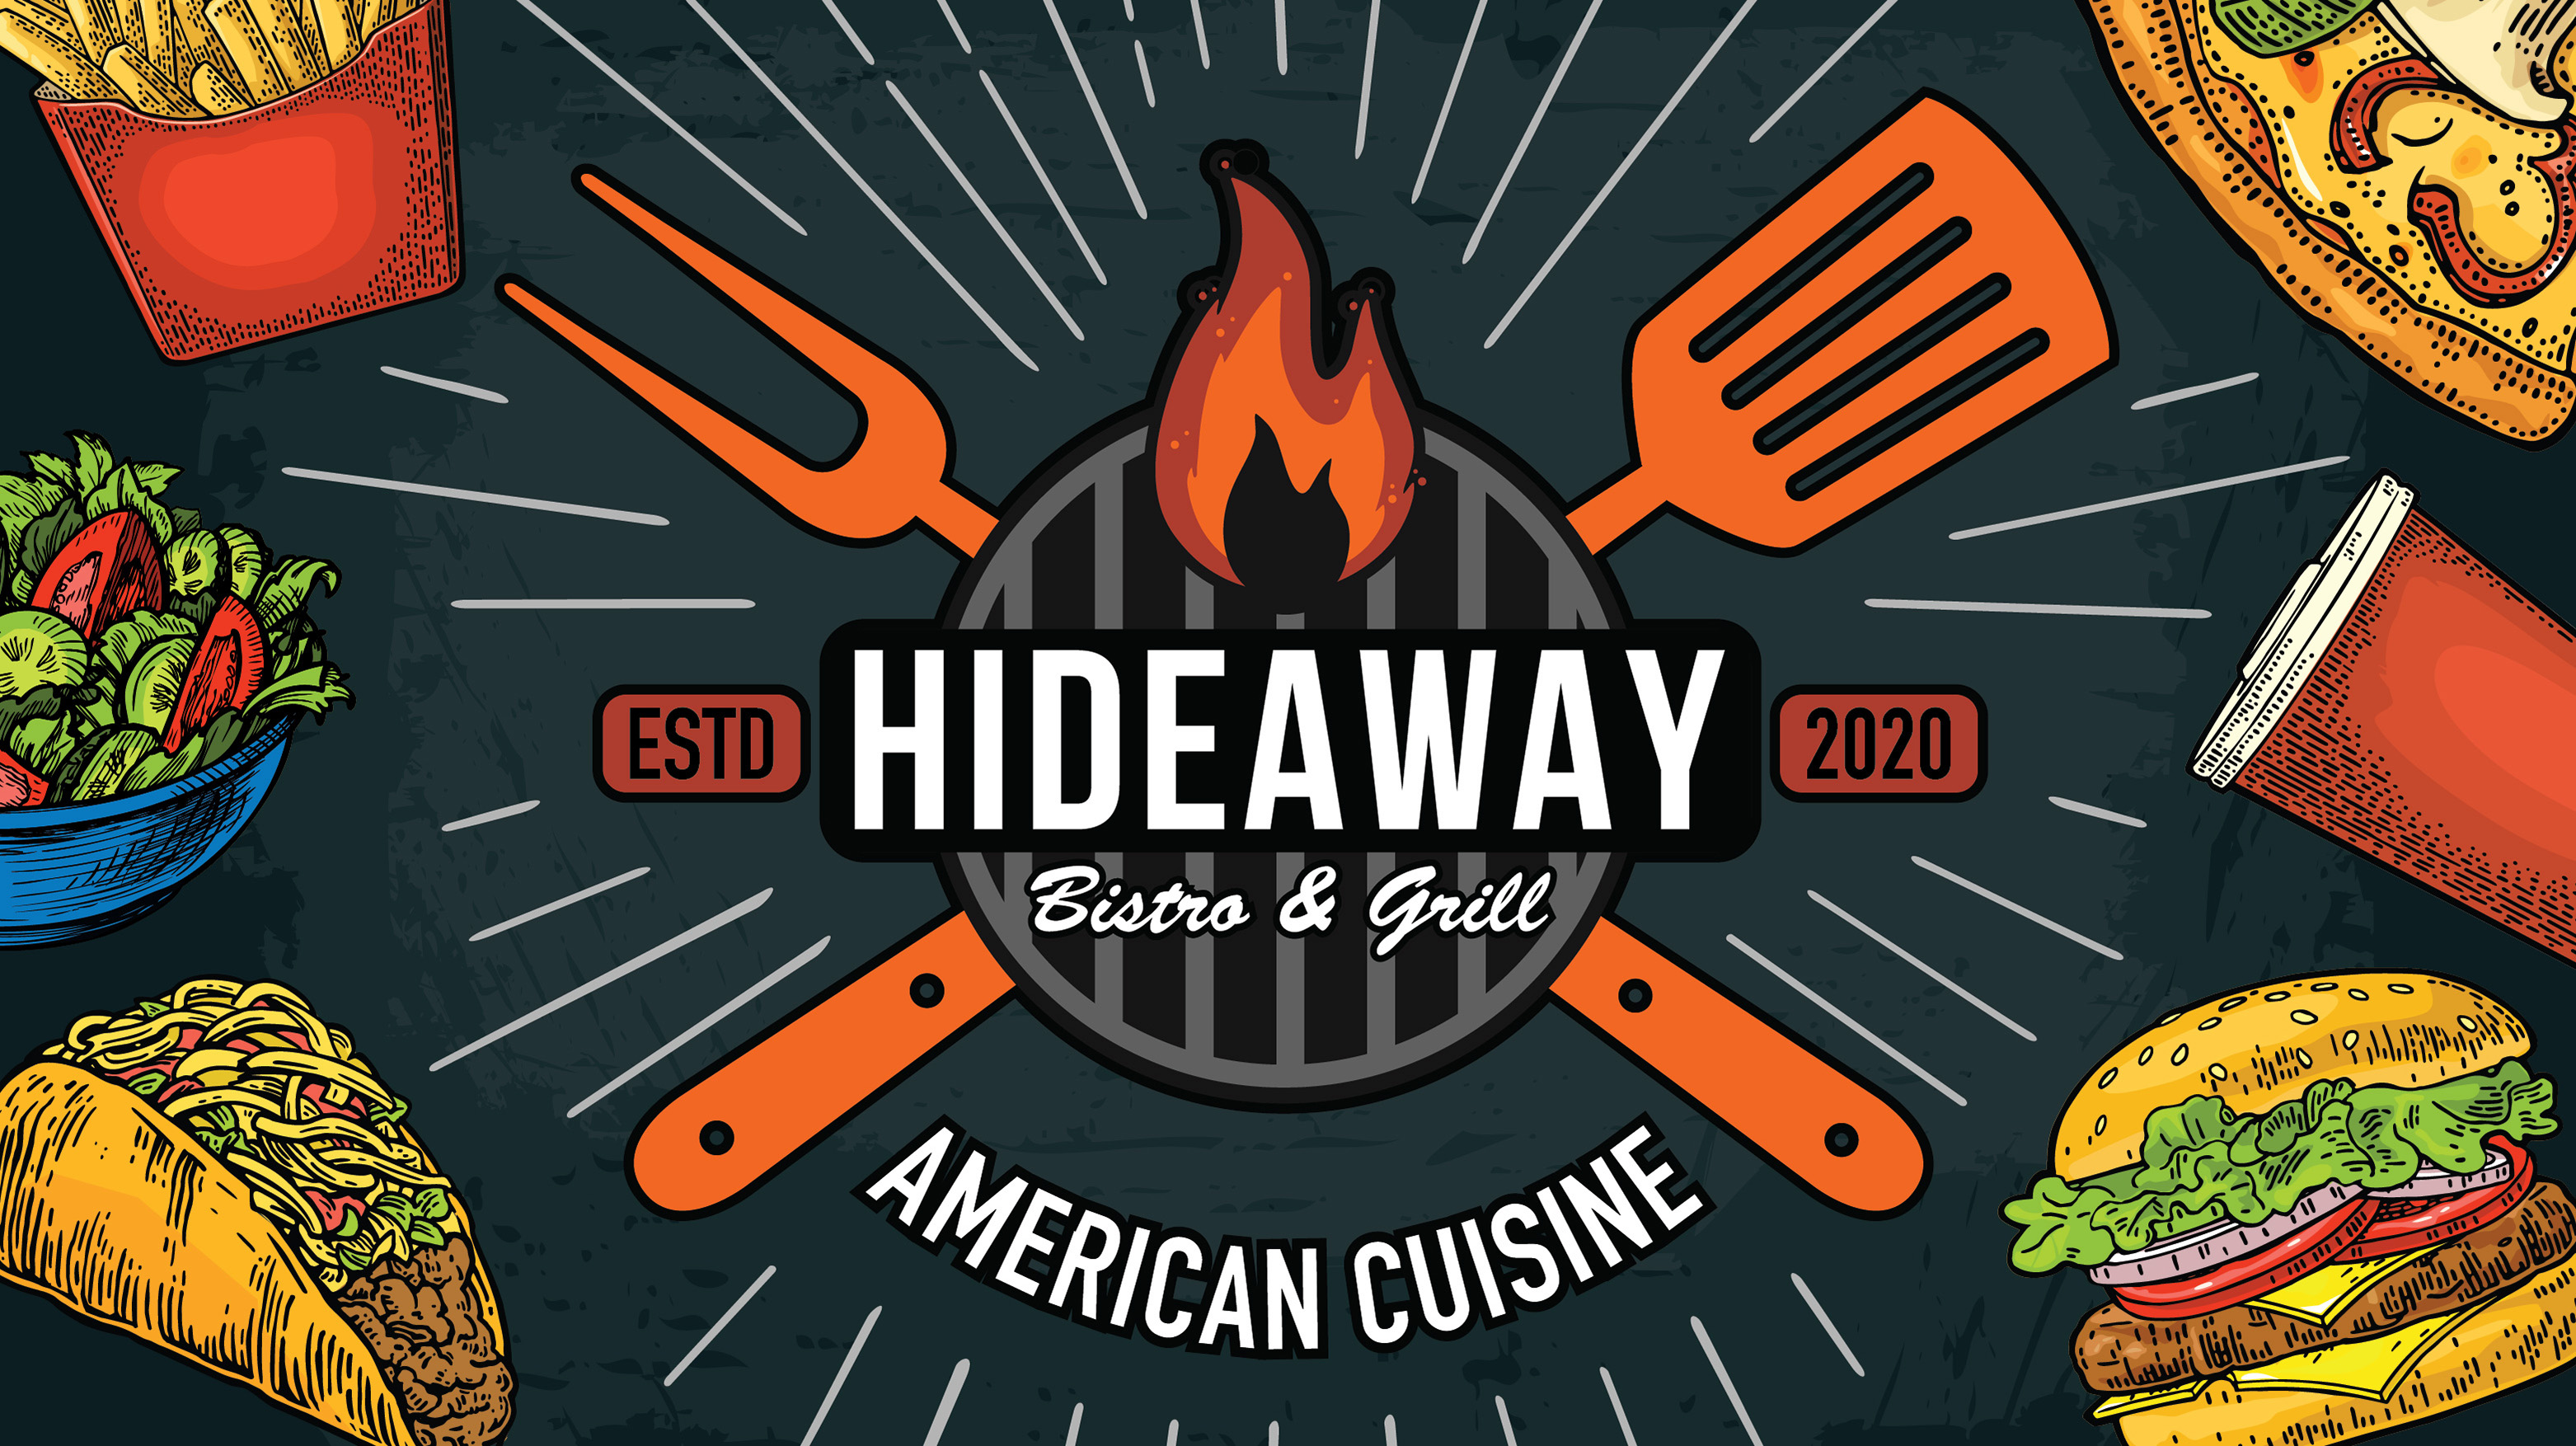 Hideaway Bistro & Grill